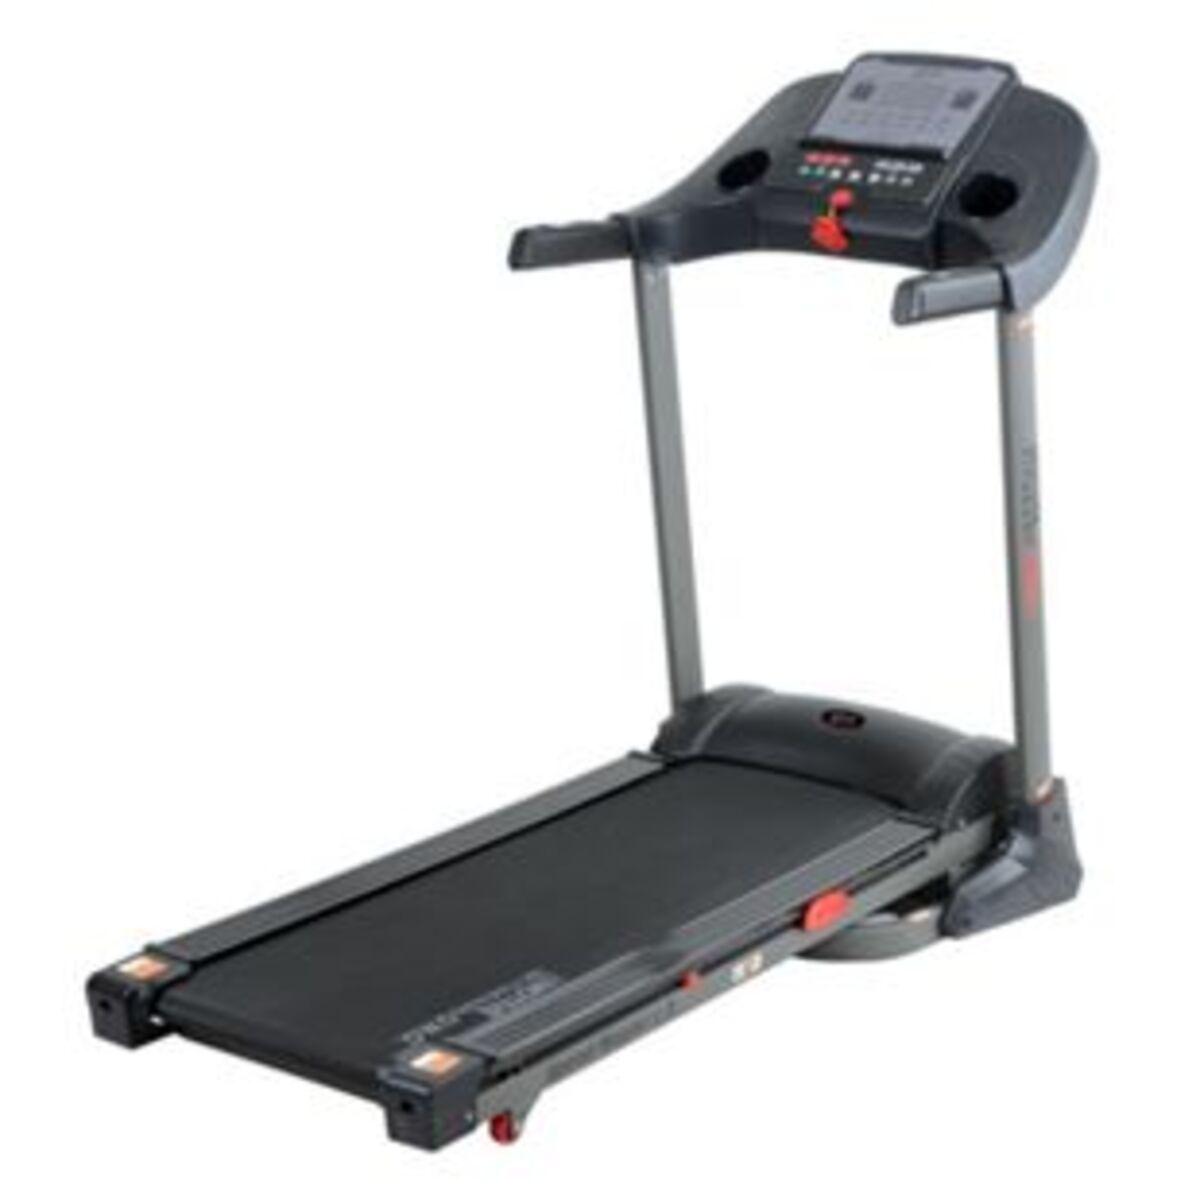 Bild 2 von Motive Fitness by U.N.O. Laufband Speed Master 1.8 grau-schwarz